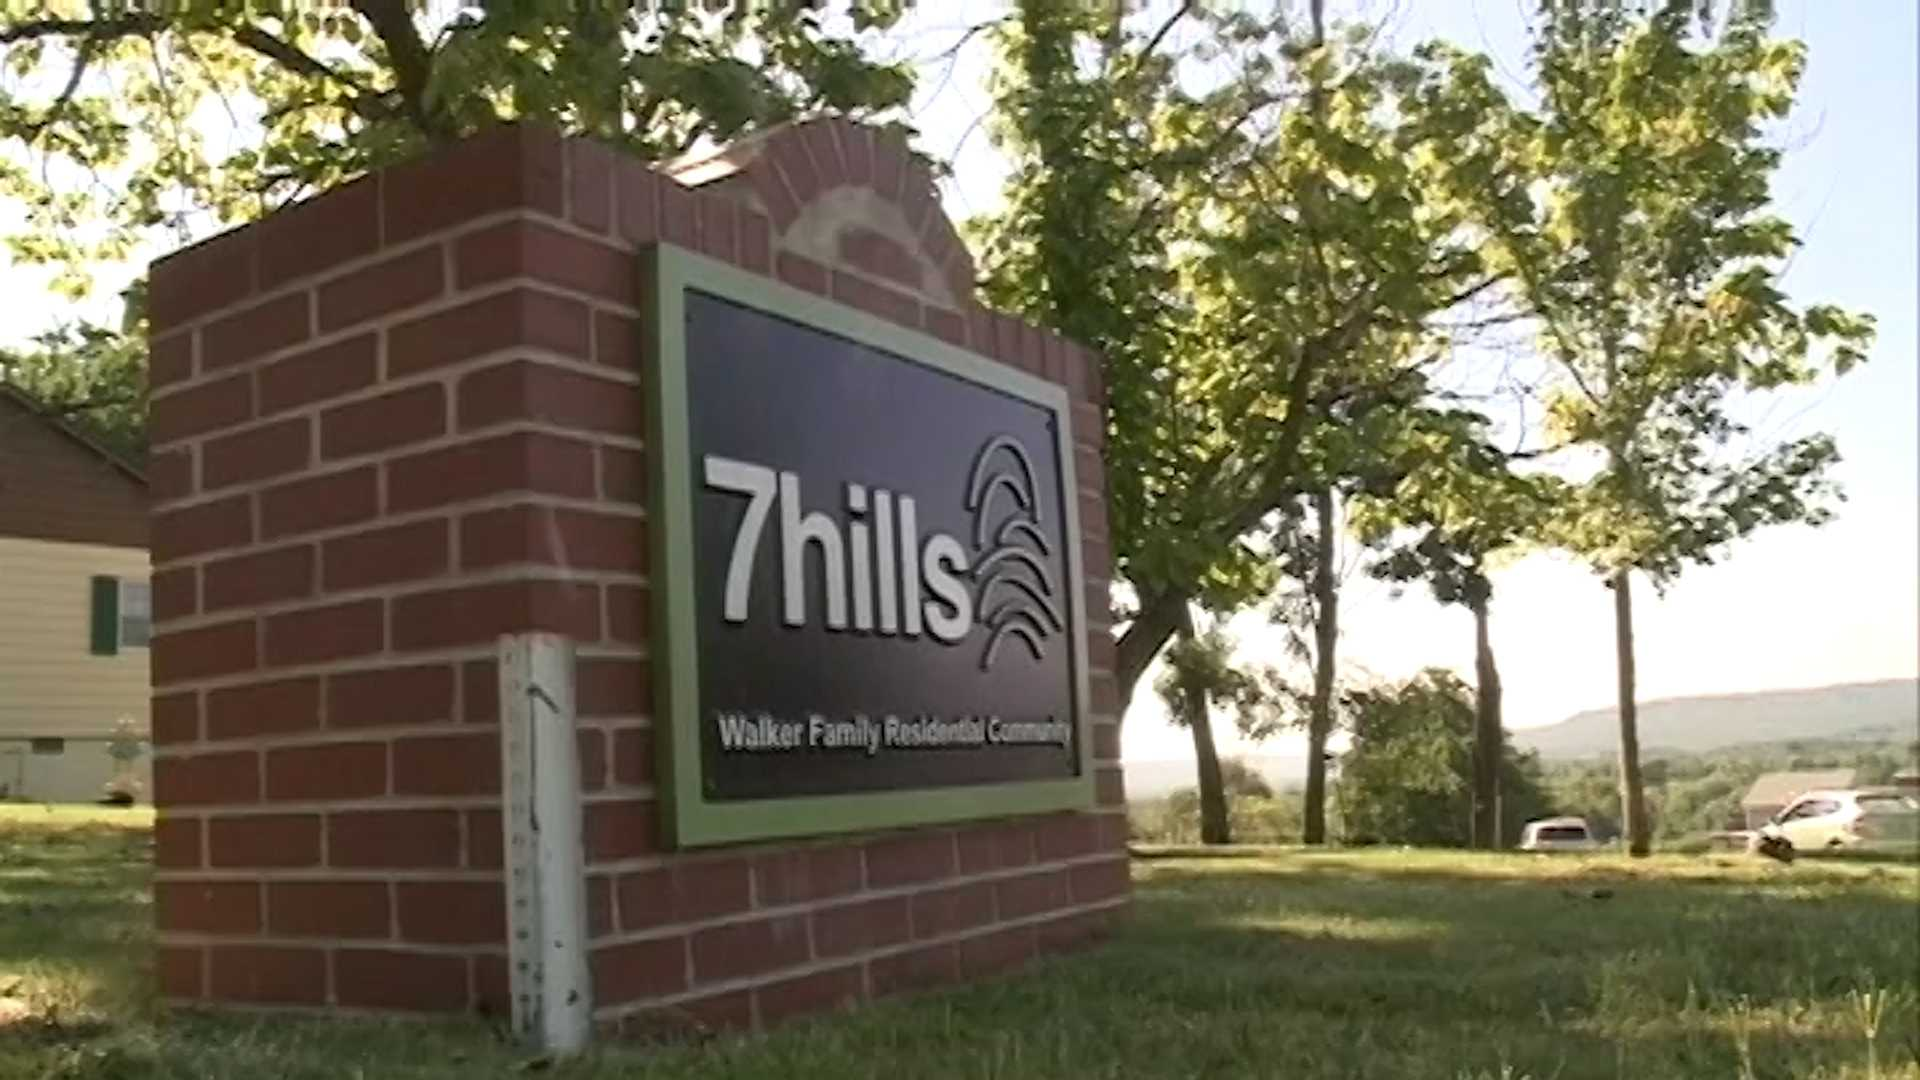 7hills Walker Family Residential Community in Fayetteville